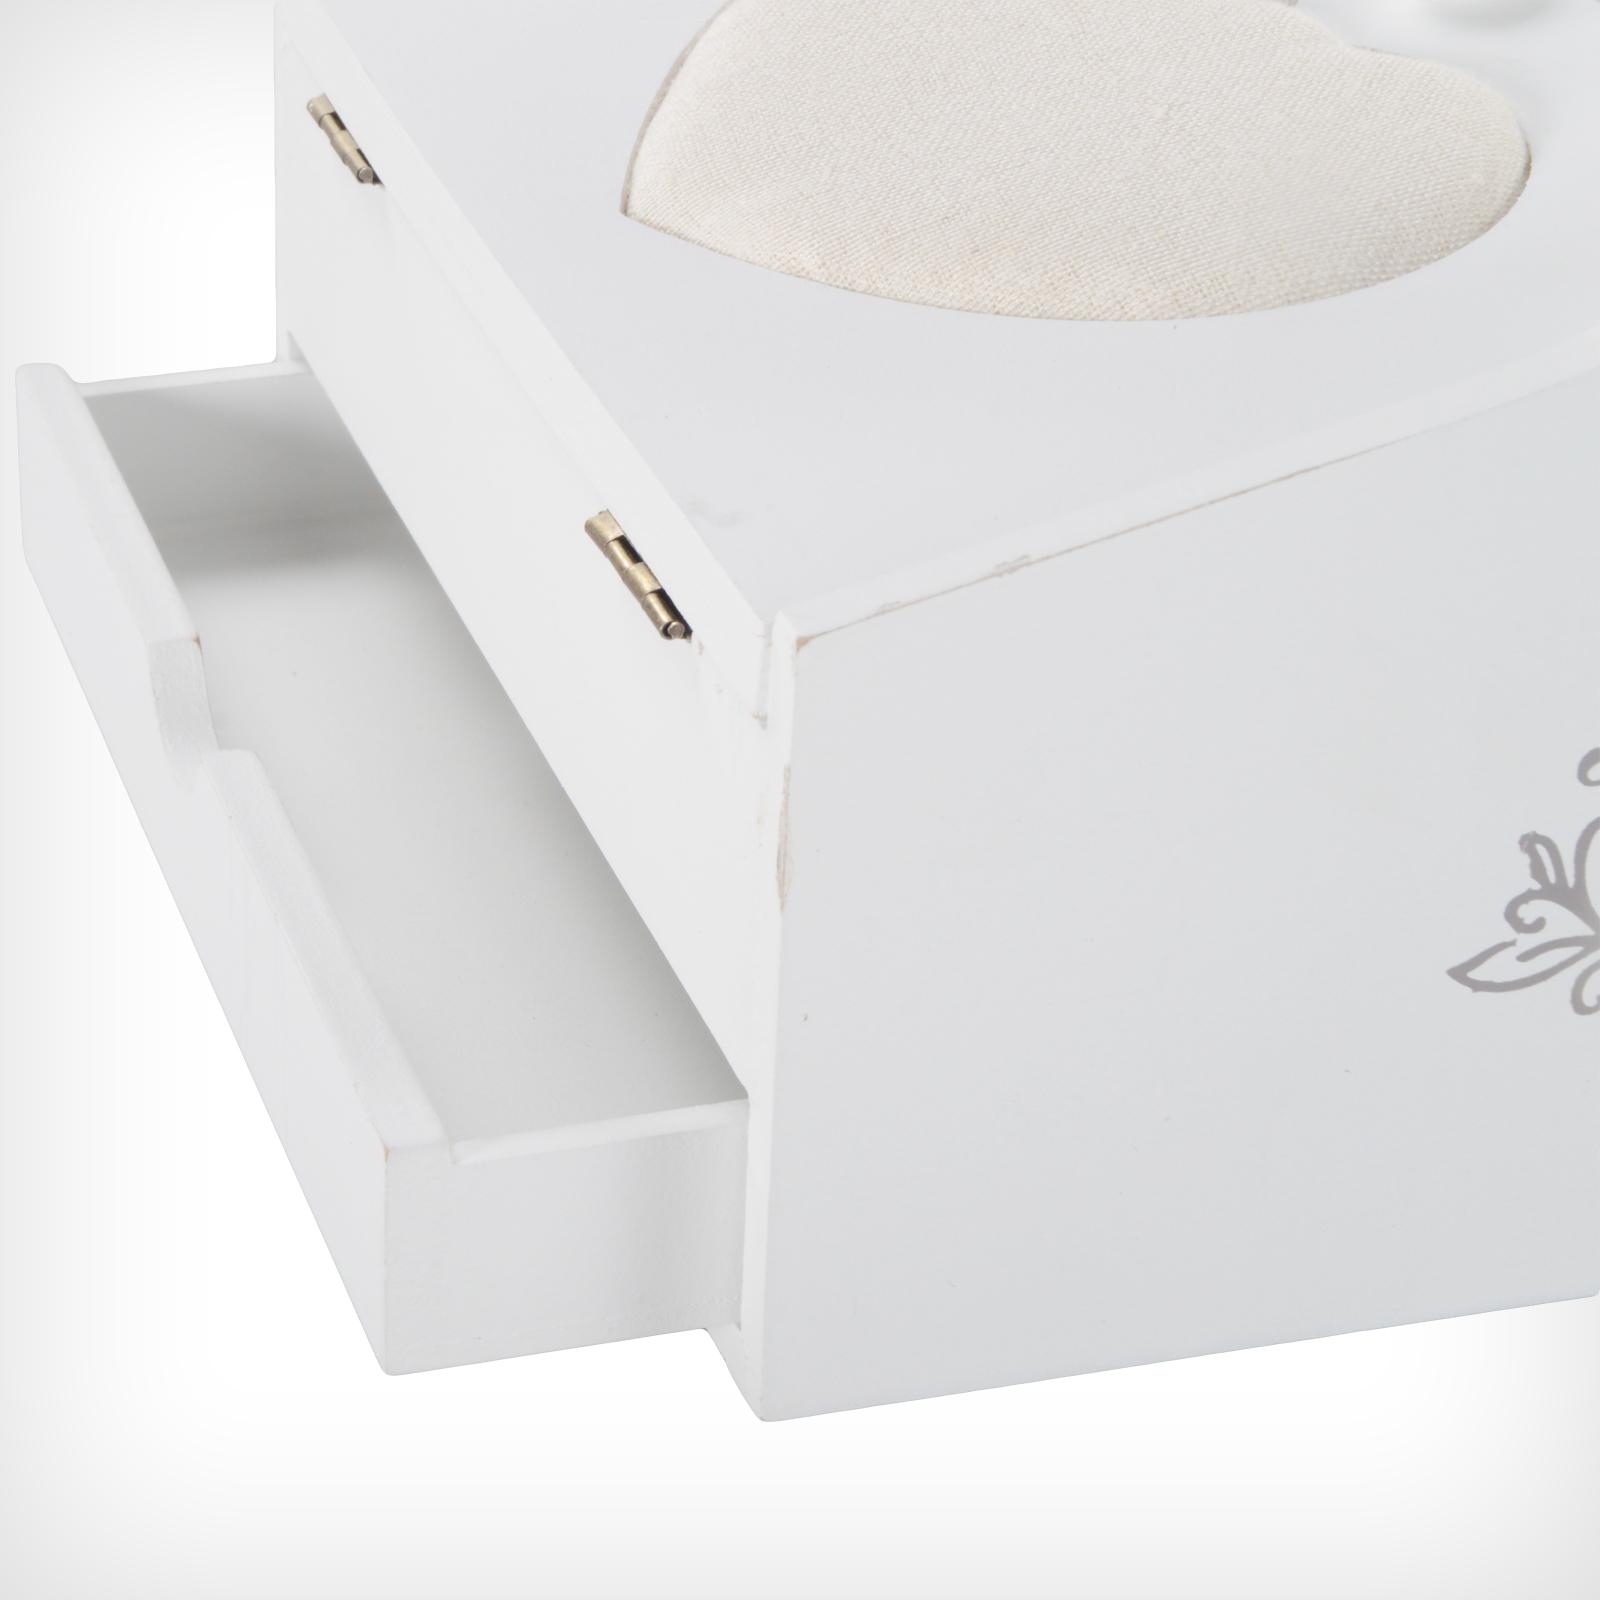 n hk stchen n hkasten n hbox n hkorb wei shabby chic nadelkissen aufbewahrung ebay. Black Bedroom Furniture Sets. Home Design Ideas